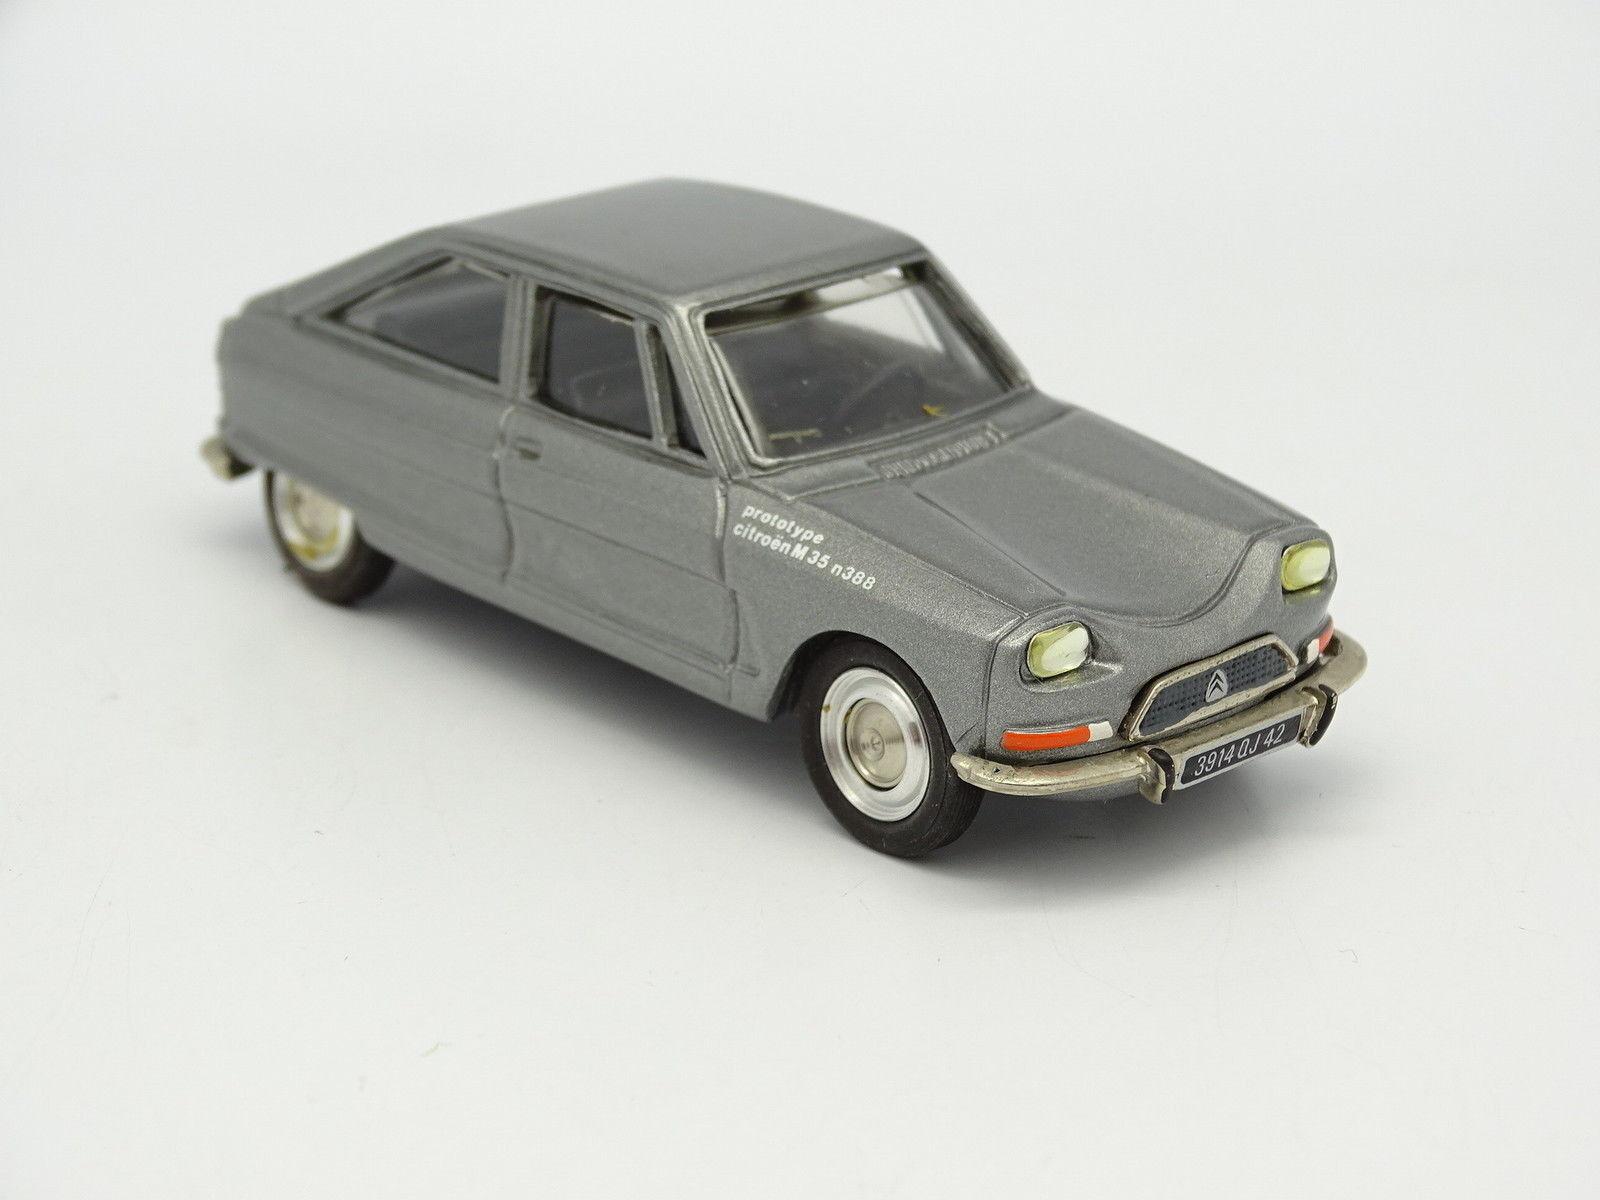 Minicar Plus Plus Plus Harz SB 1 43 - Citroen AMI 8 predotyp M35 1970 15ede7